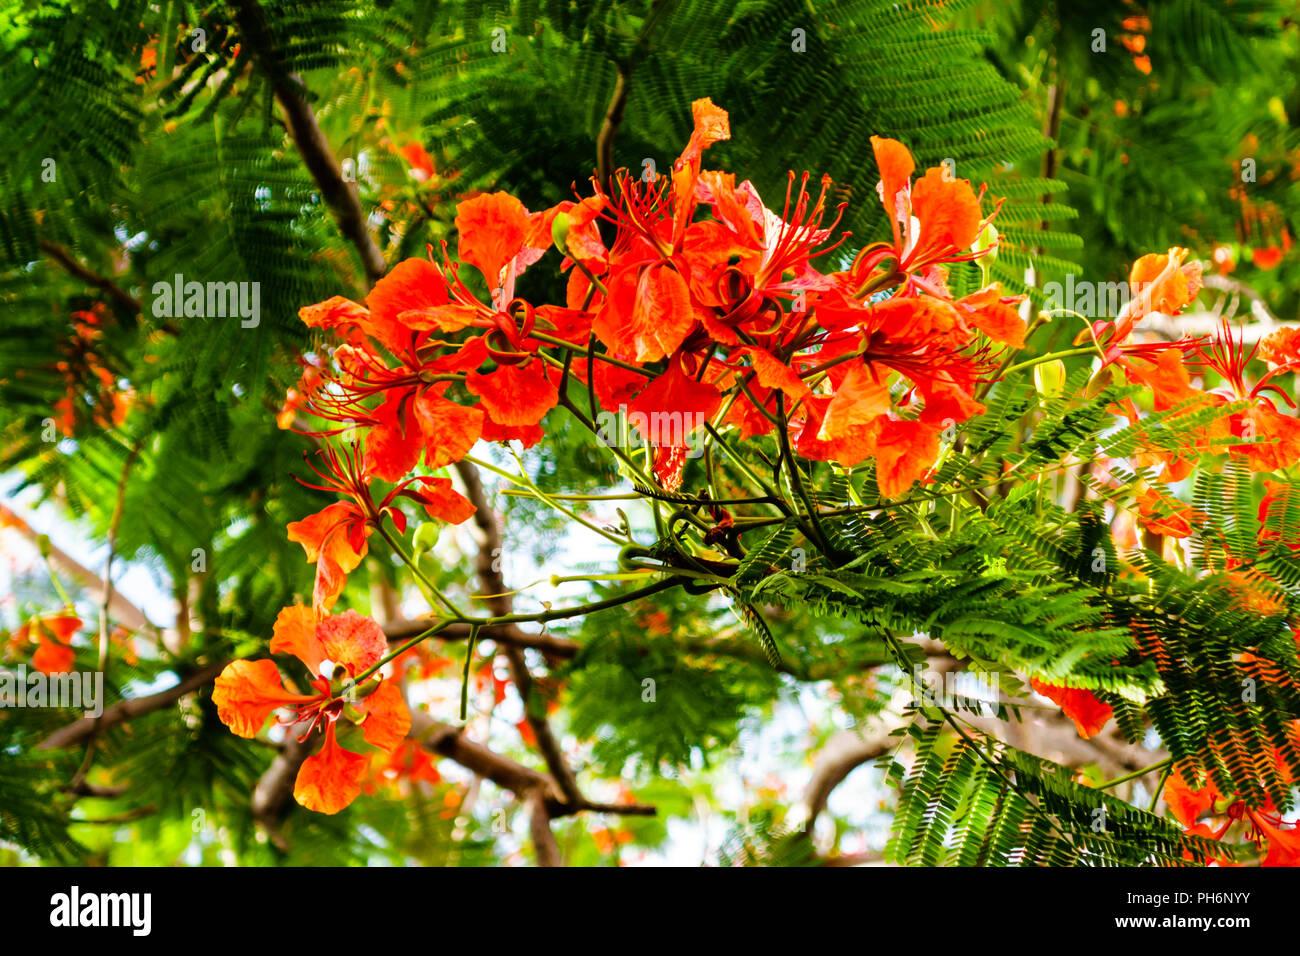 Flamboyant - Stock Image